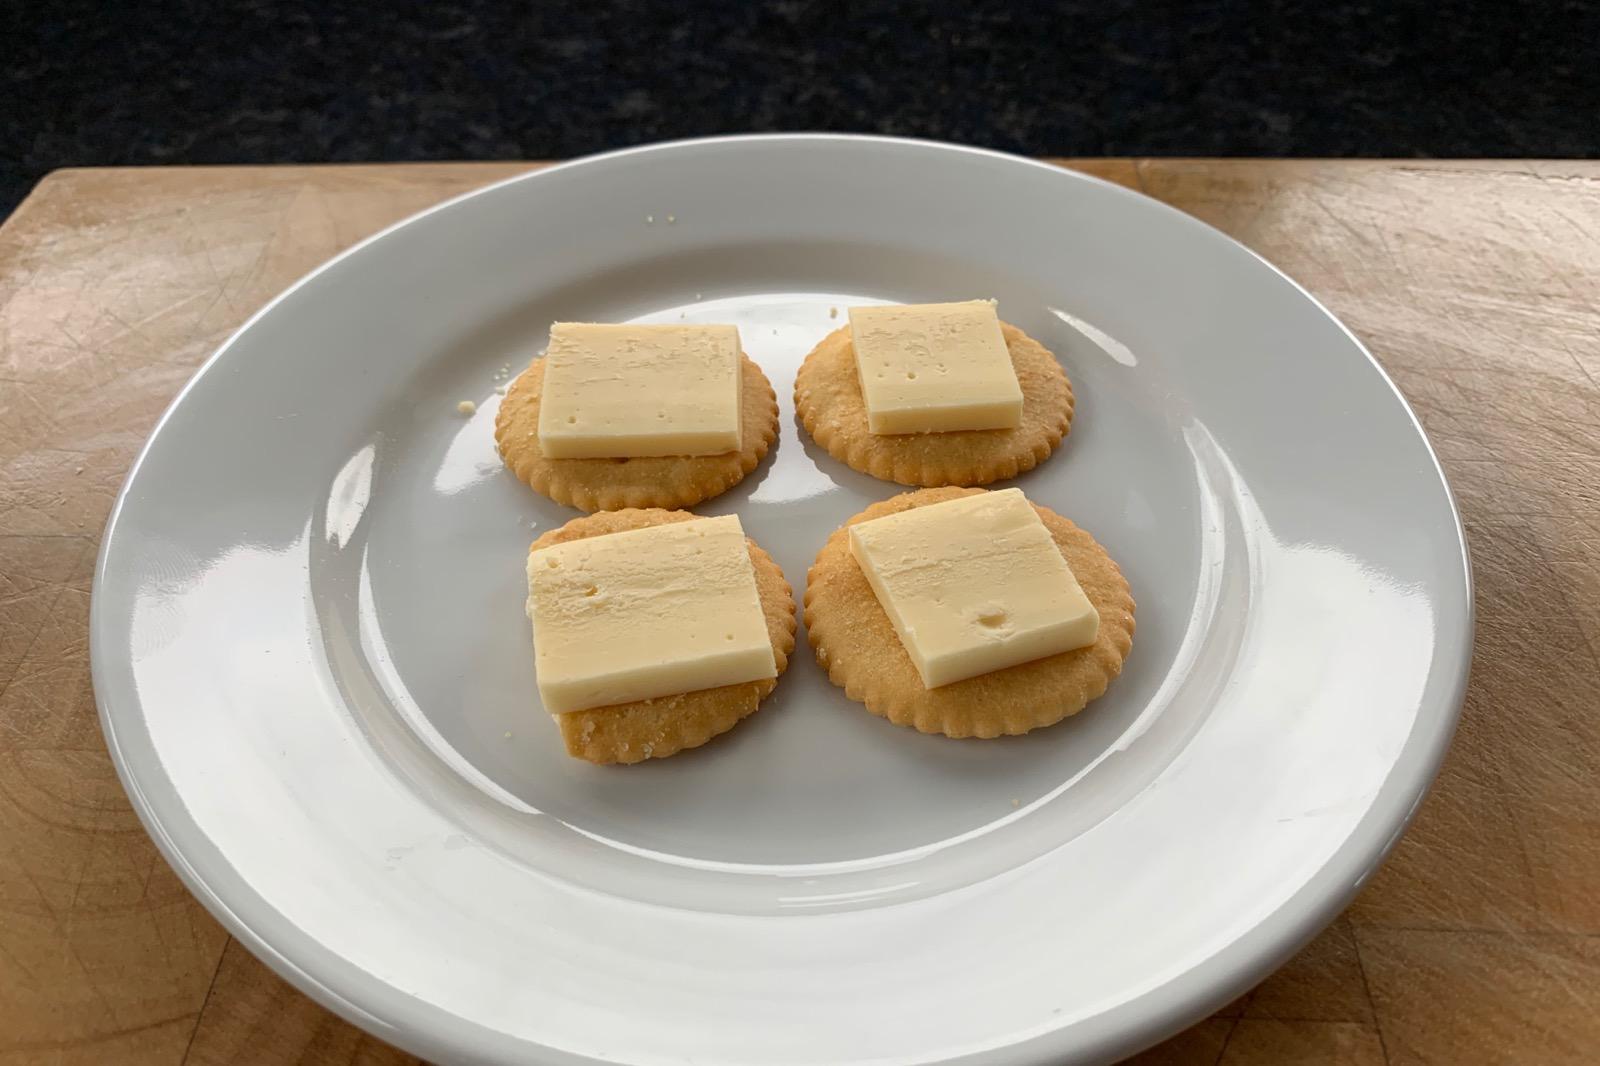 http://blog.rickk.com/food/2020/03/04/ate.2020.03.03.s1.jpg